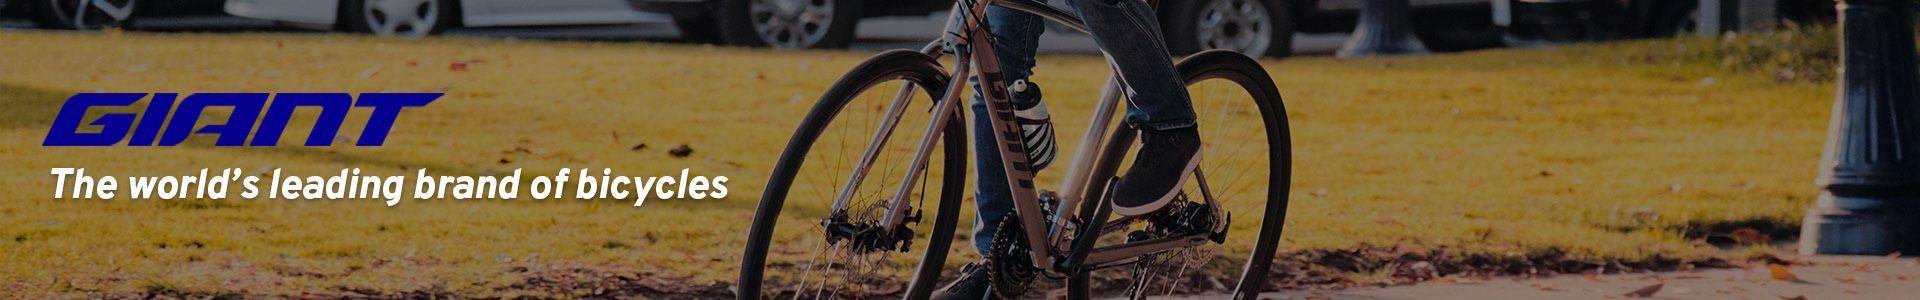 Giant Bicycles